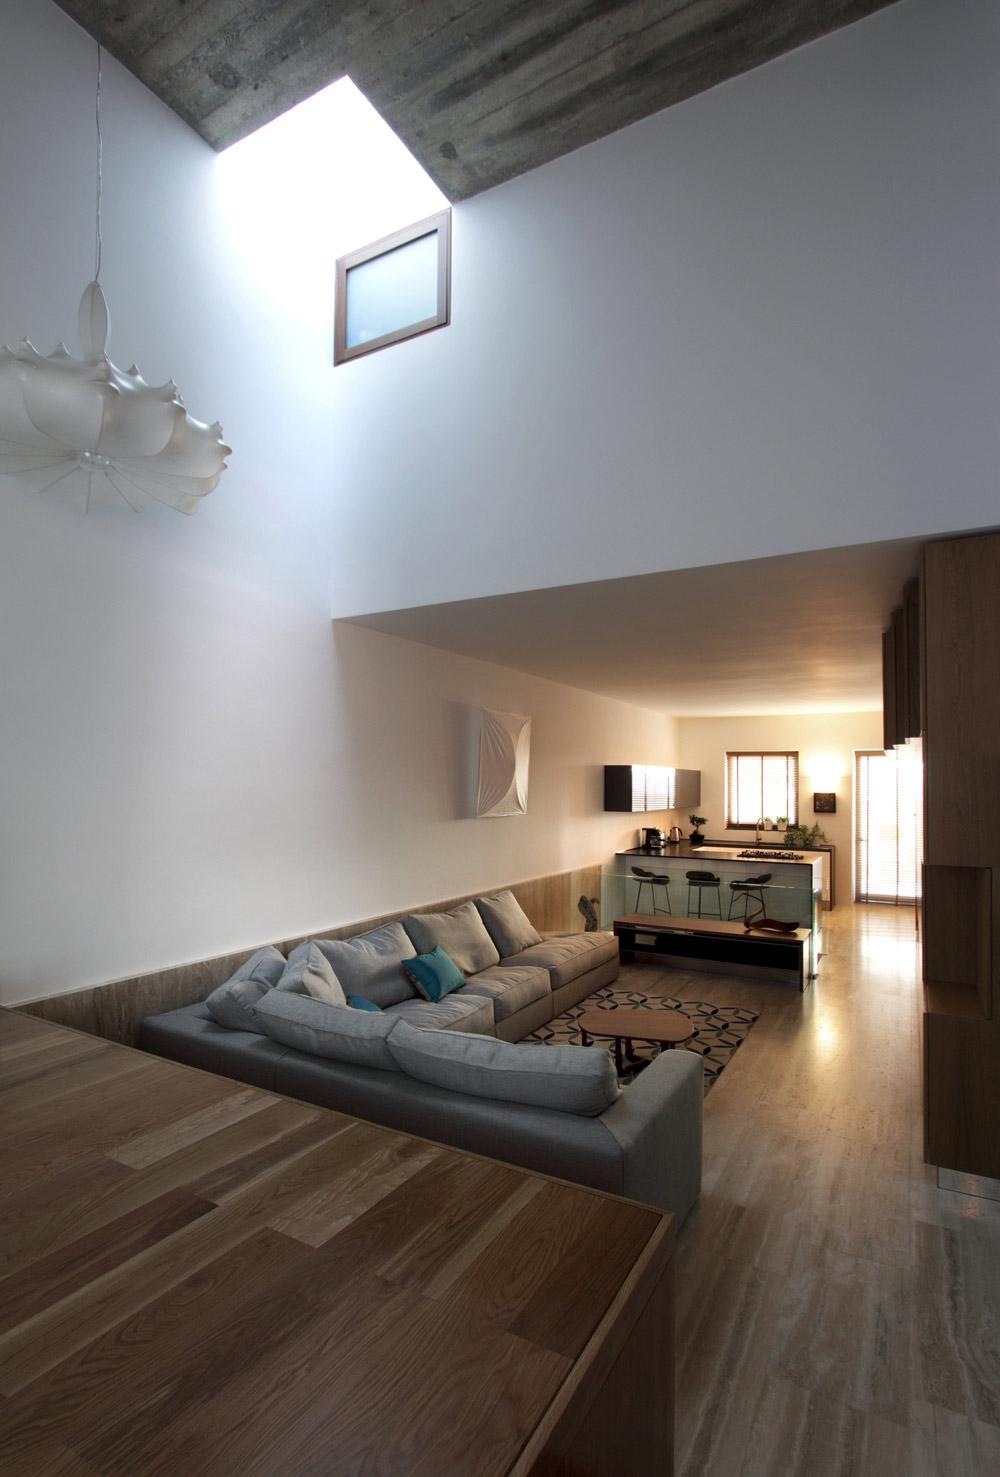 Kitchen, Breakfast Bar, Sofa, Hanging Home in Naxxar, Malta by Chris Briffa Architects